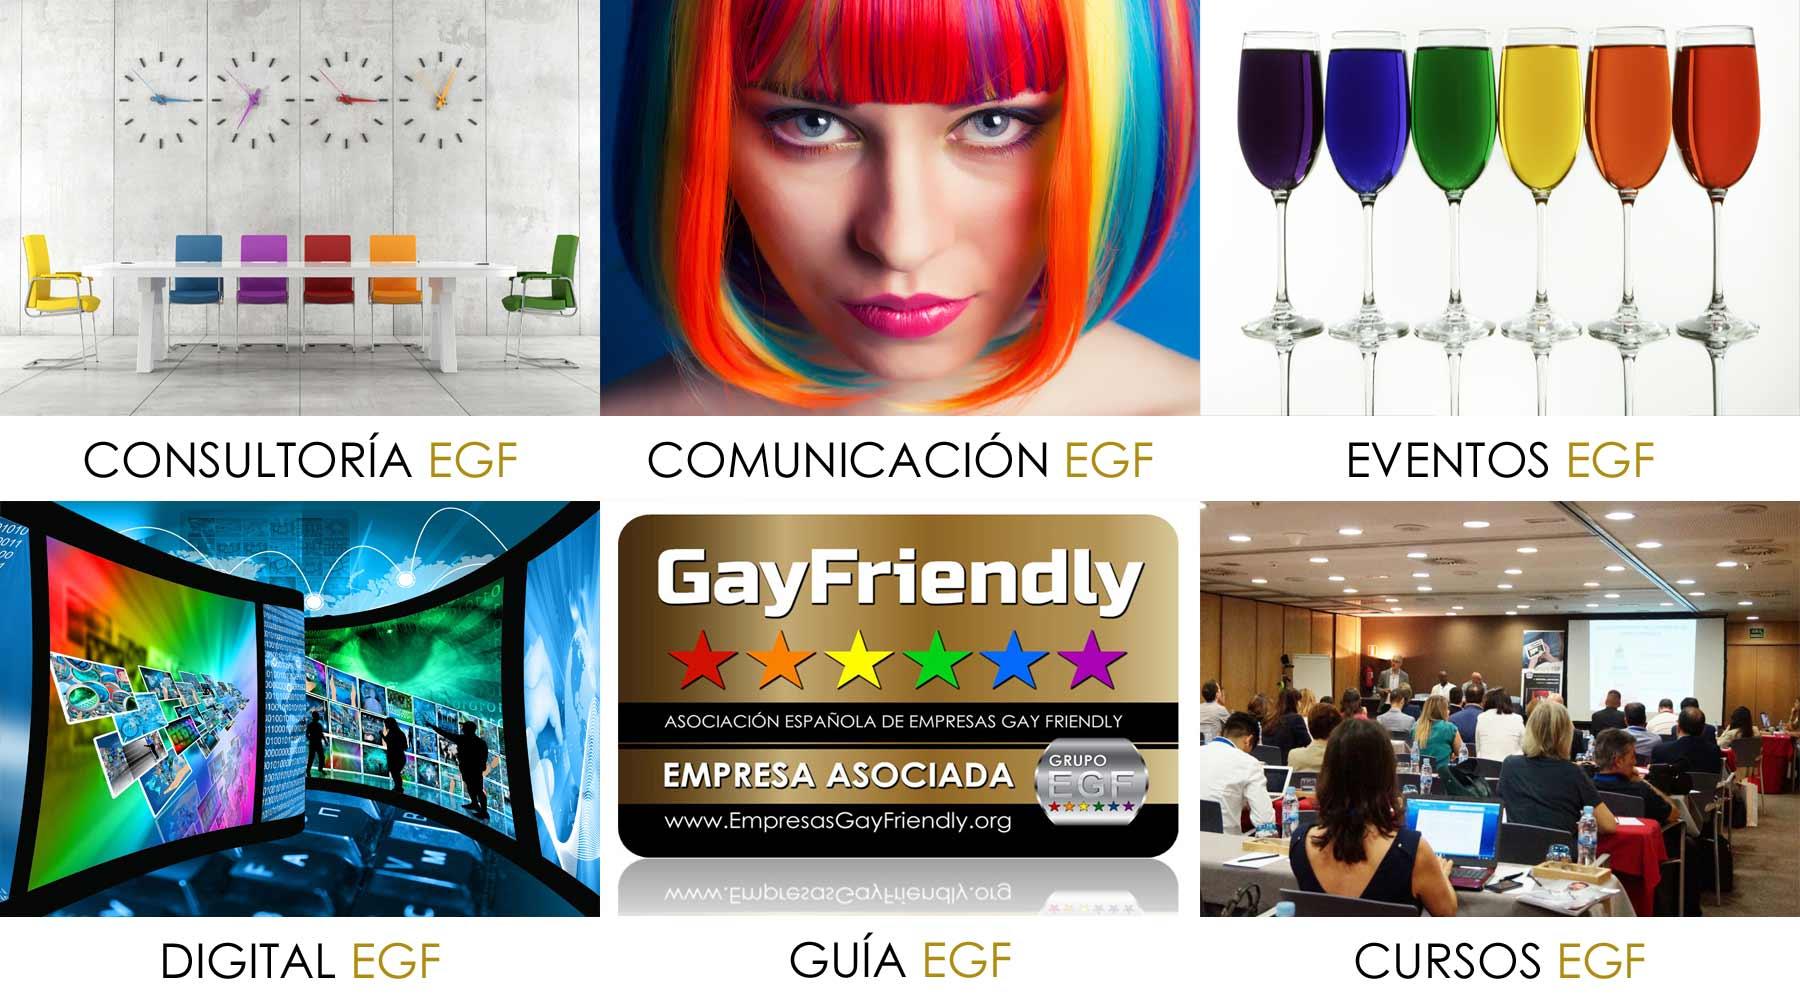 Grupo EGF, consultora experta en el mercado gay (LGBT)